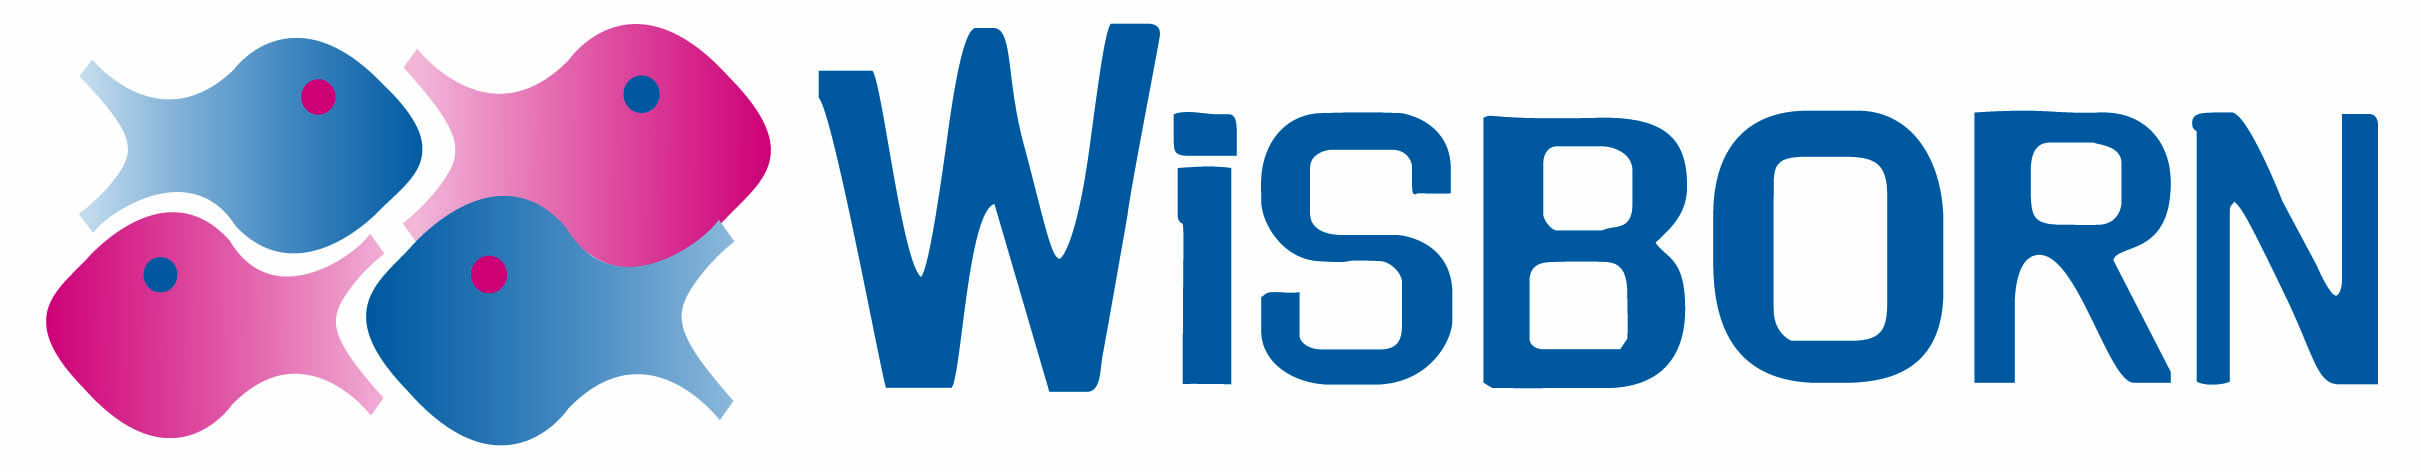 Wisborn